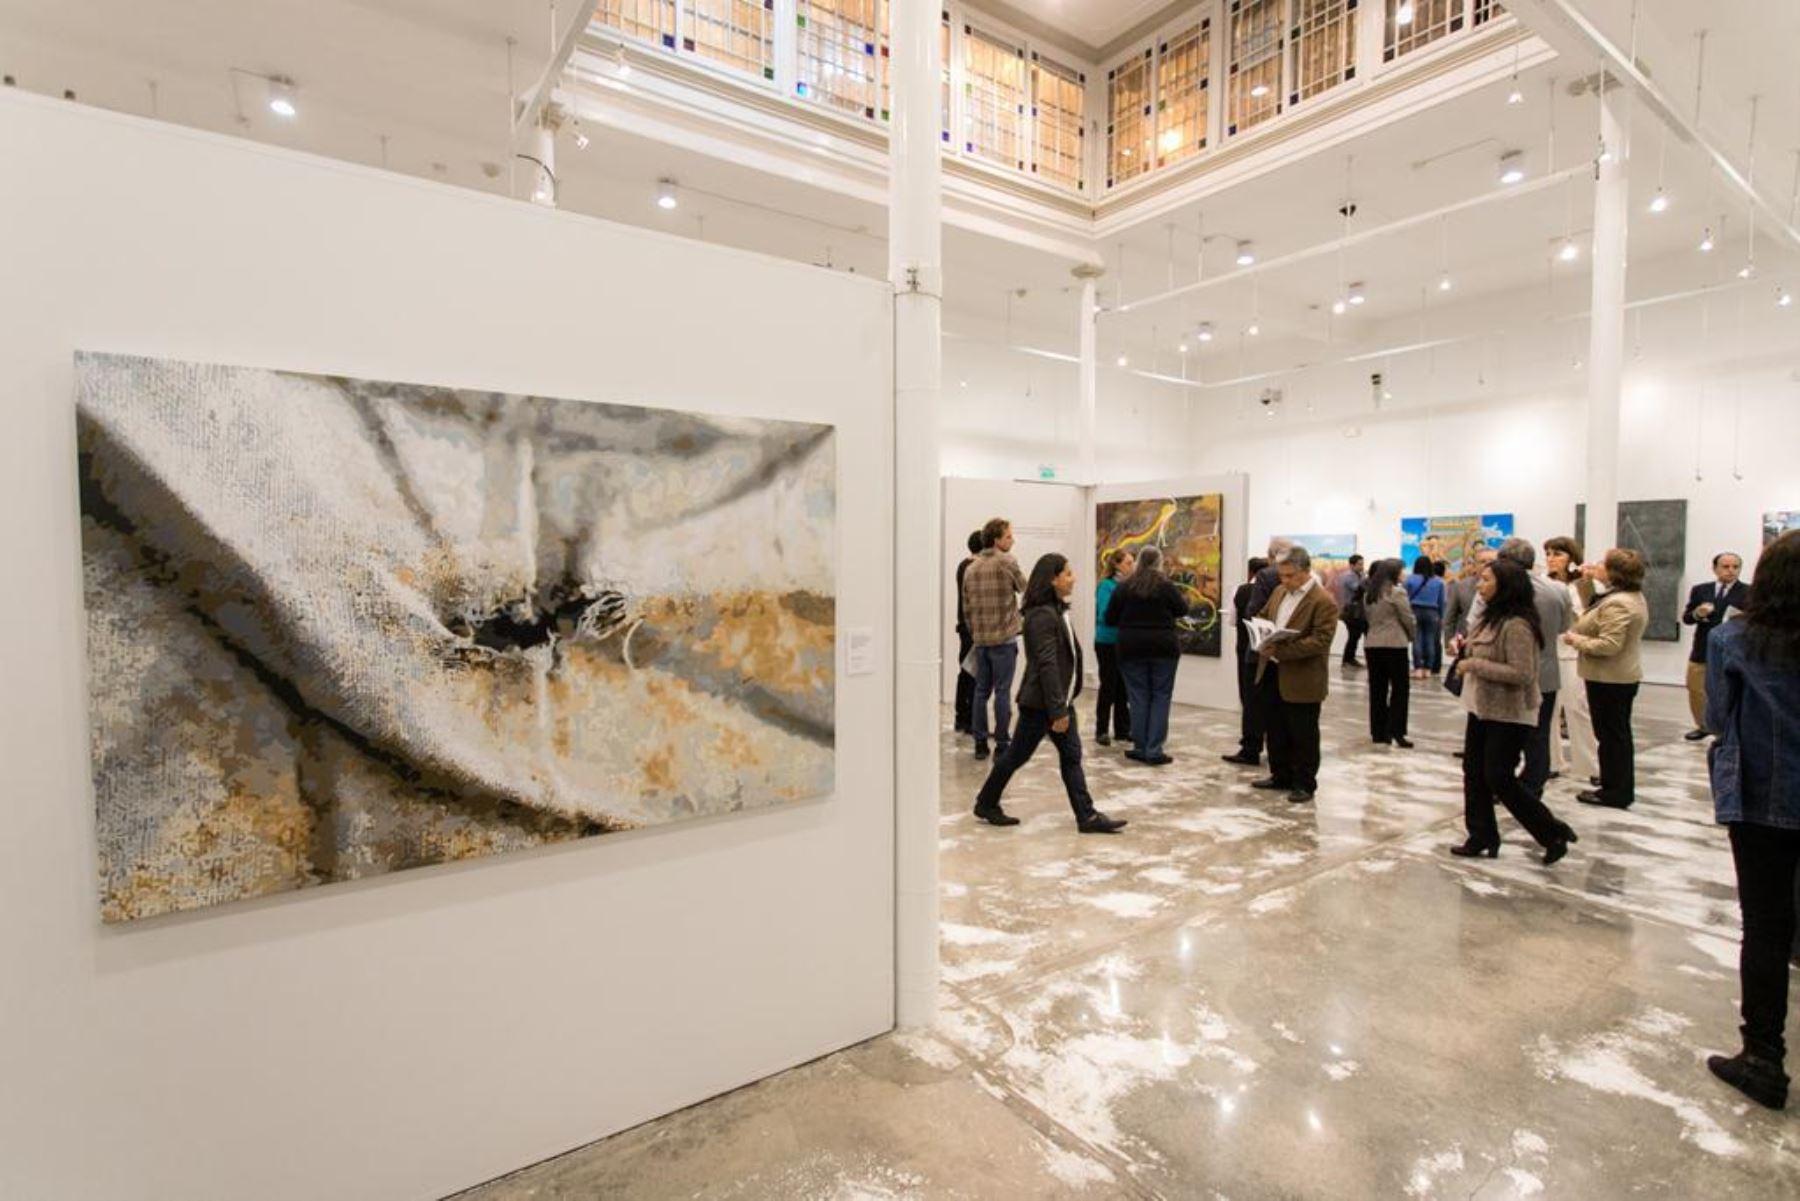 Museo Central del BCRP lanza convocatoria a artistas peruanos.